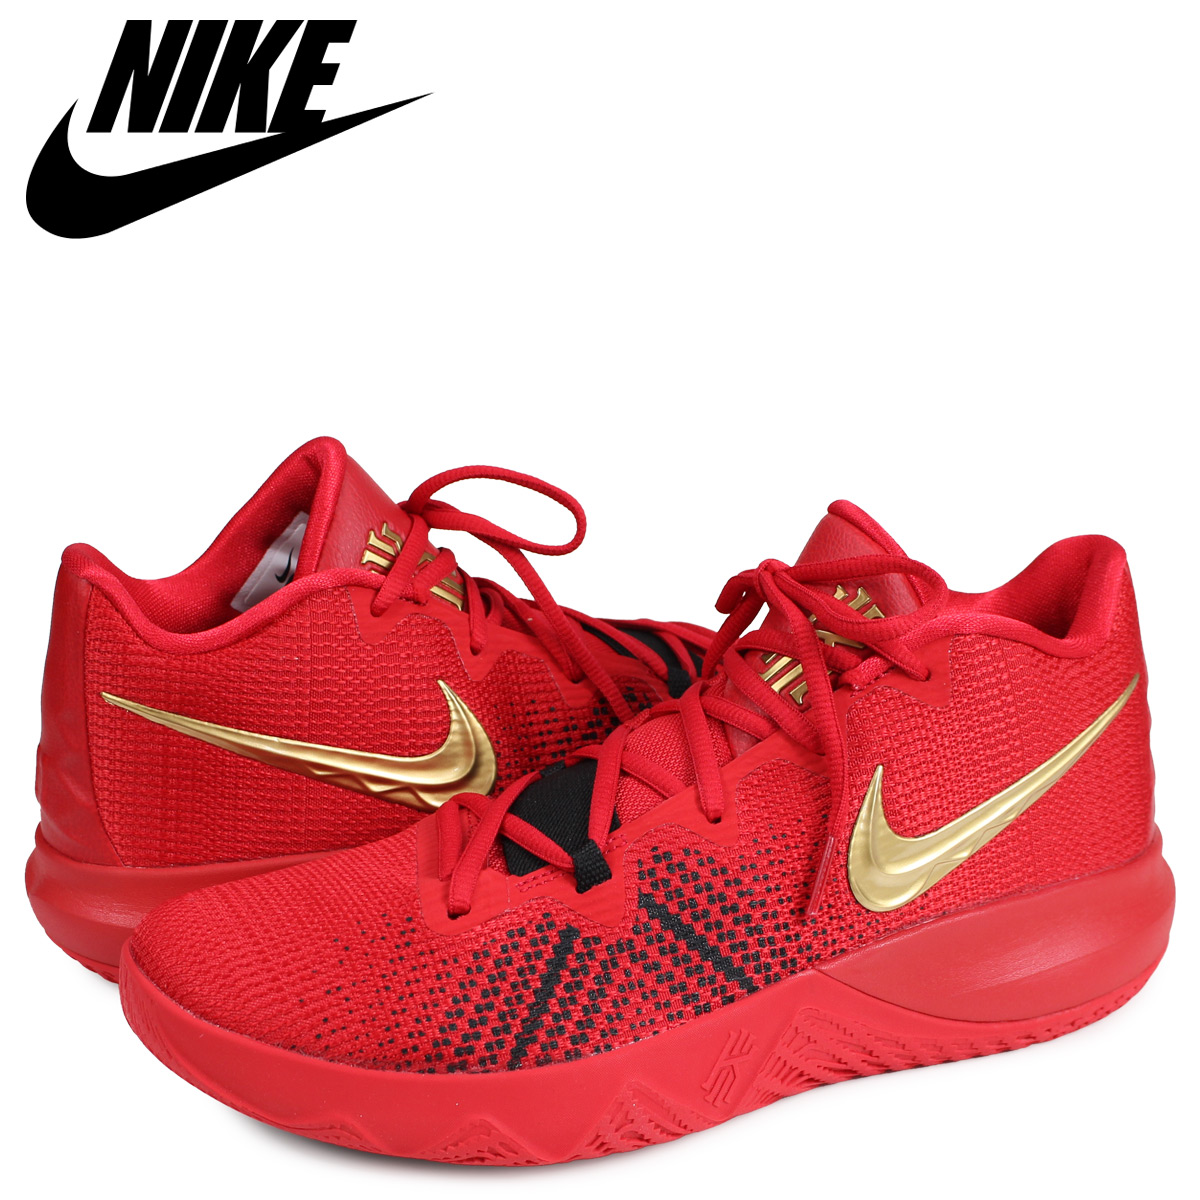 promo code 67705 4cc15 NIKE Nike chi leaf light lap sneakers men KYRIE FLYTRAP red AA7071-600